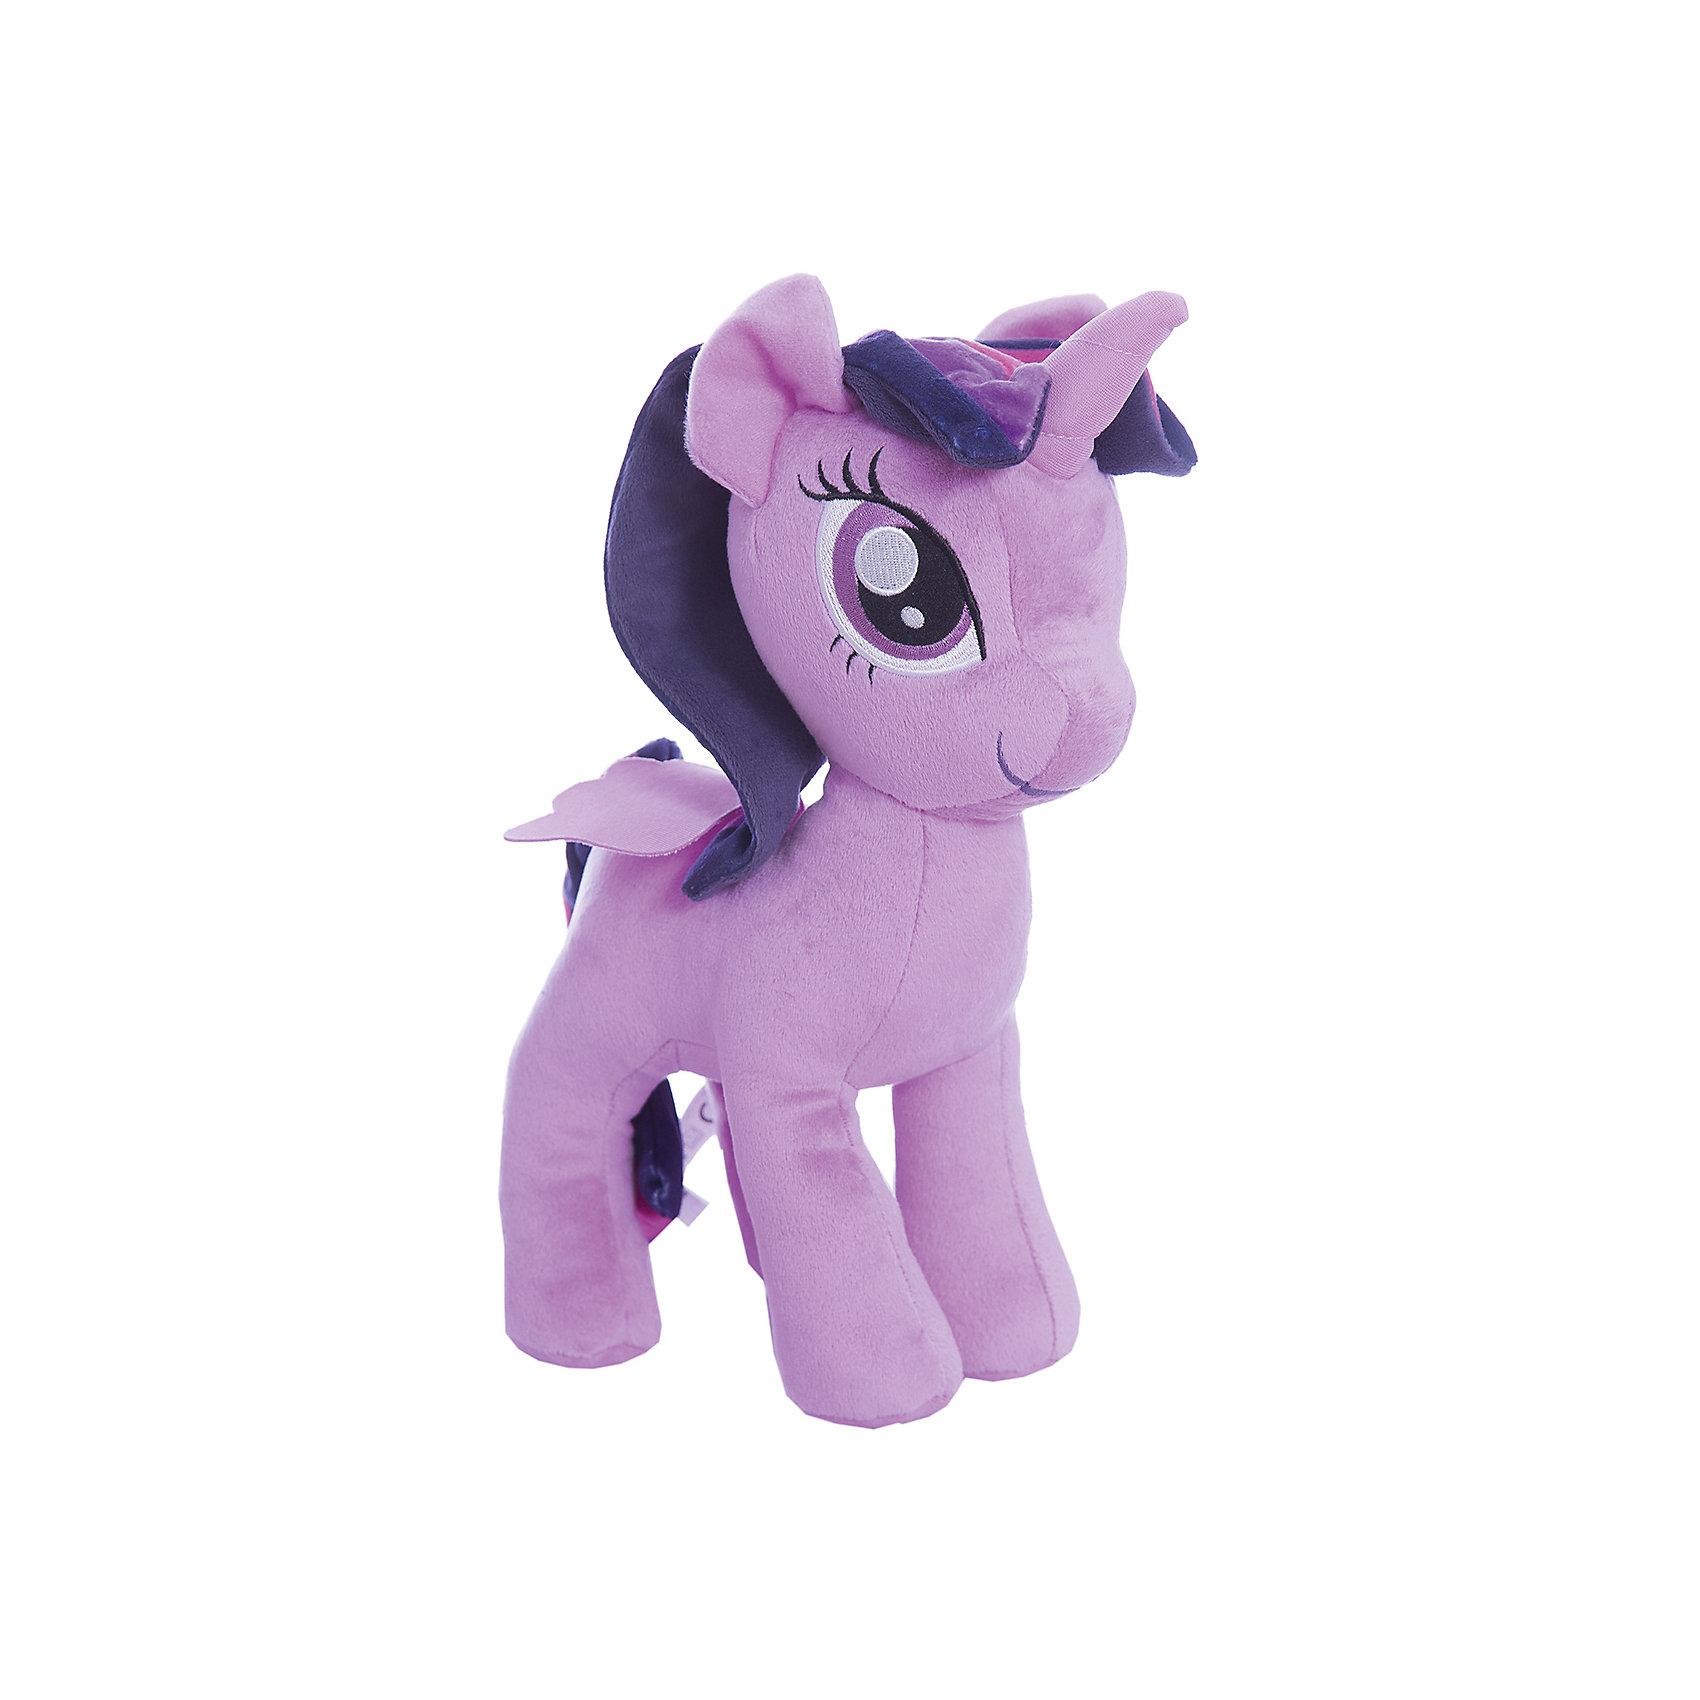 Плюшевые пони, B9817/C0113, My little Pony, HasbroЛюбимые герои<br><br><br>Ширина мм: 89<br>Глубина мм: 203<br>Высота мм: 305<br>Вес г: 259<br>Возраст от месяцев: 36<br>Возраст до месяцев: 84<br>Пол: Женский<br>Возраст: Детский<br>SKU: 6861721